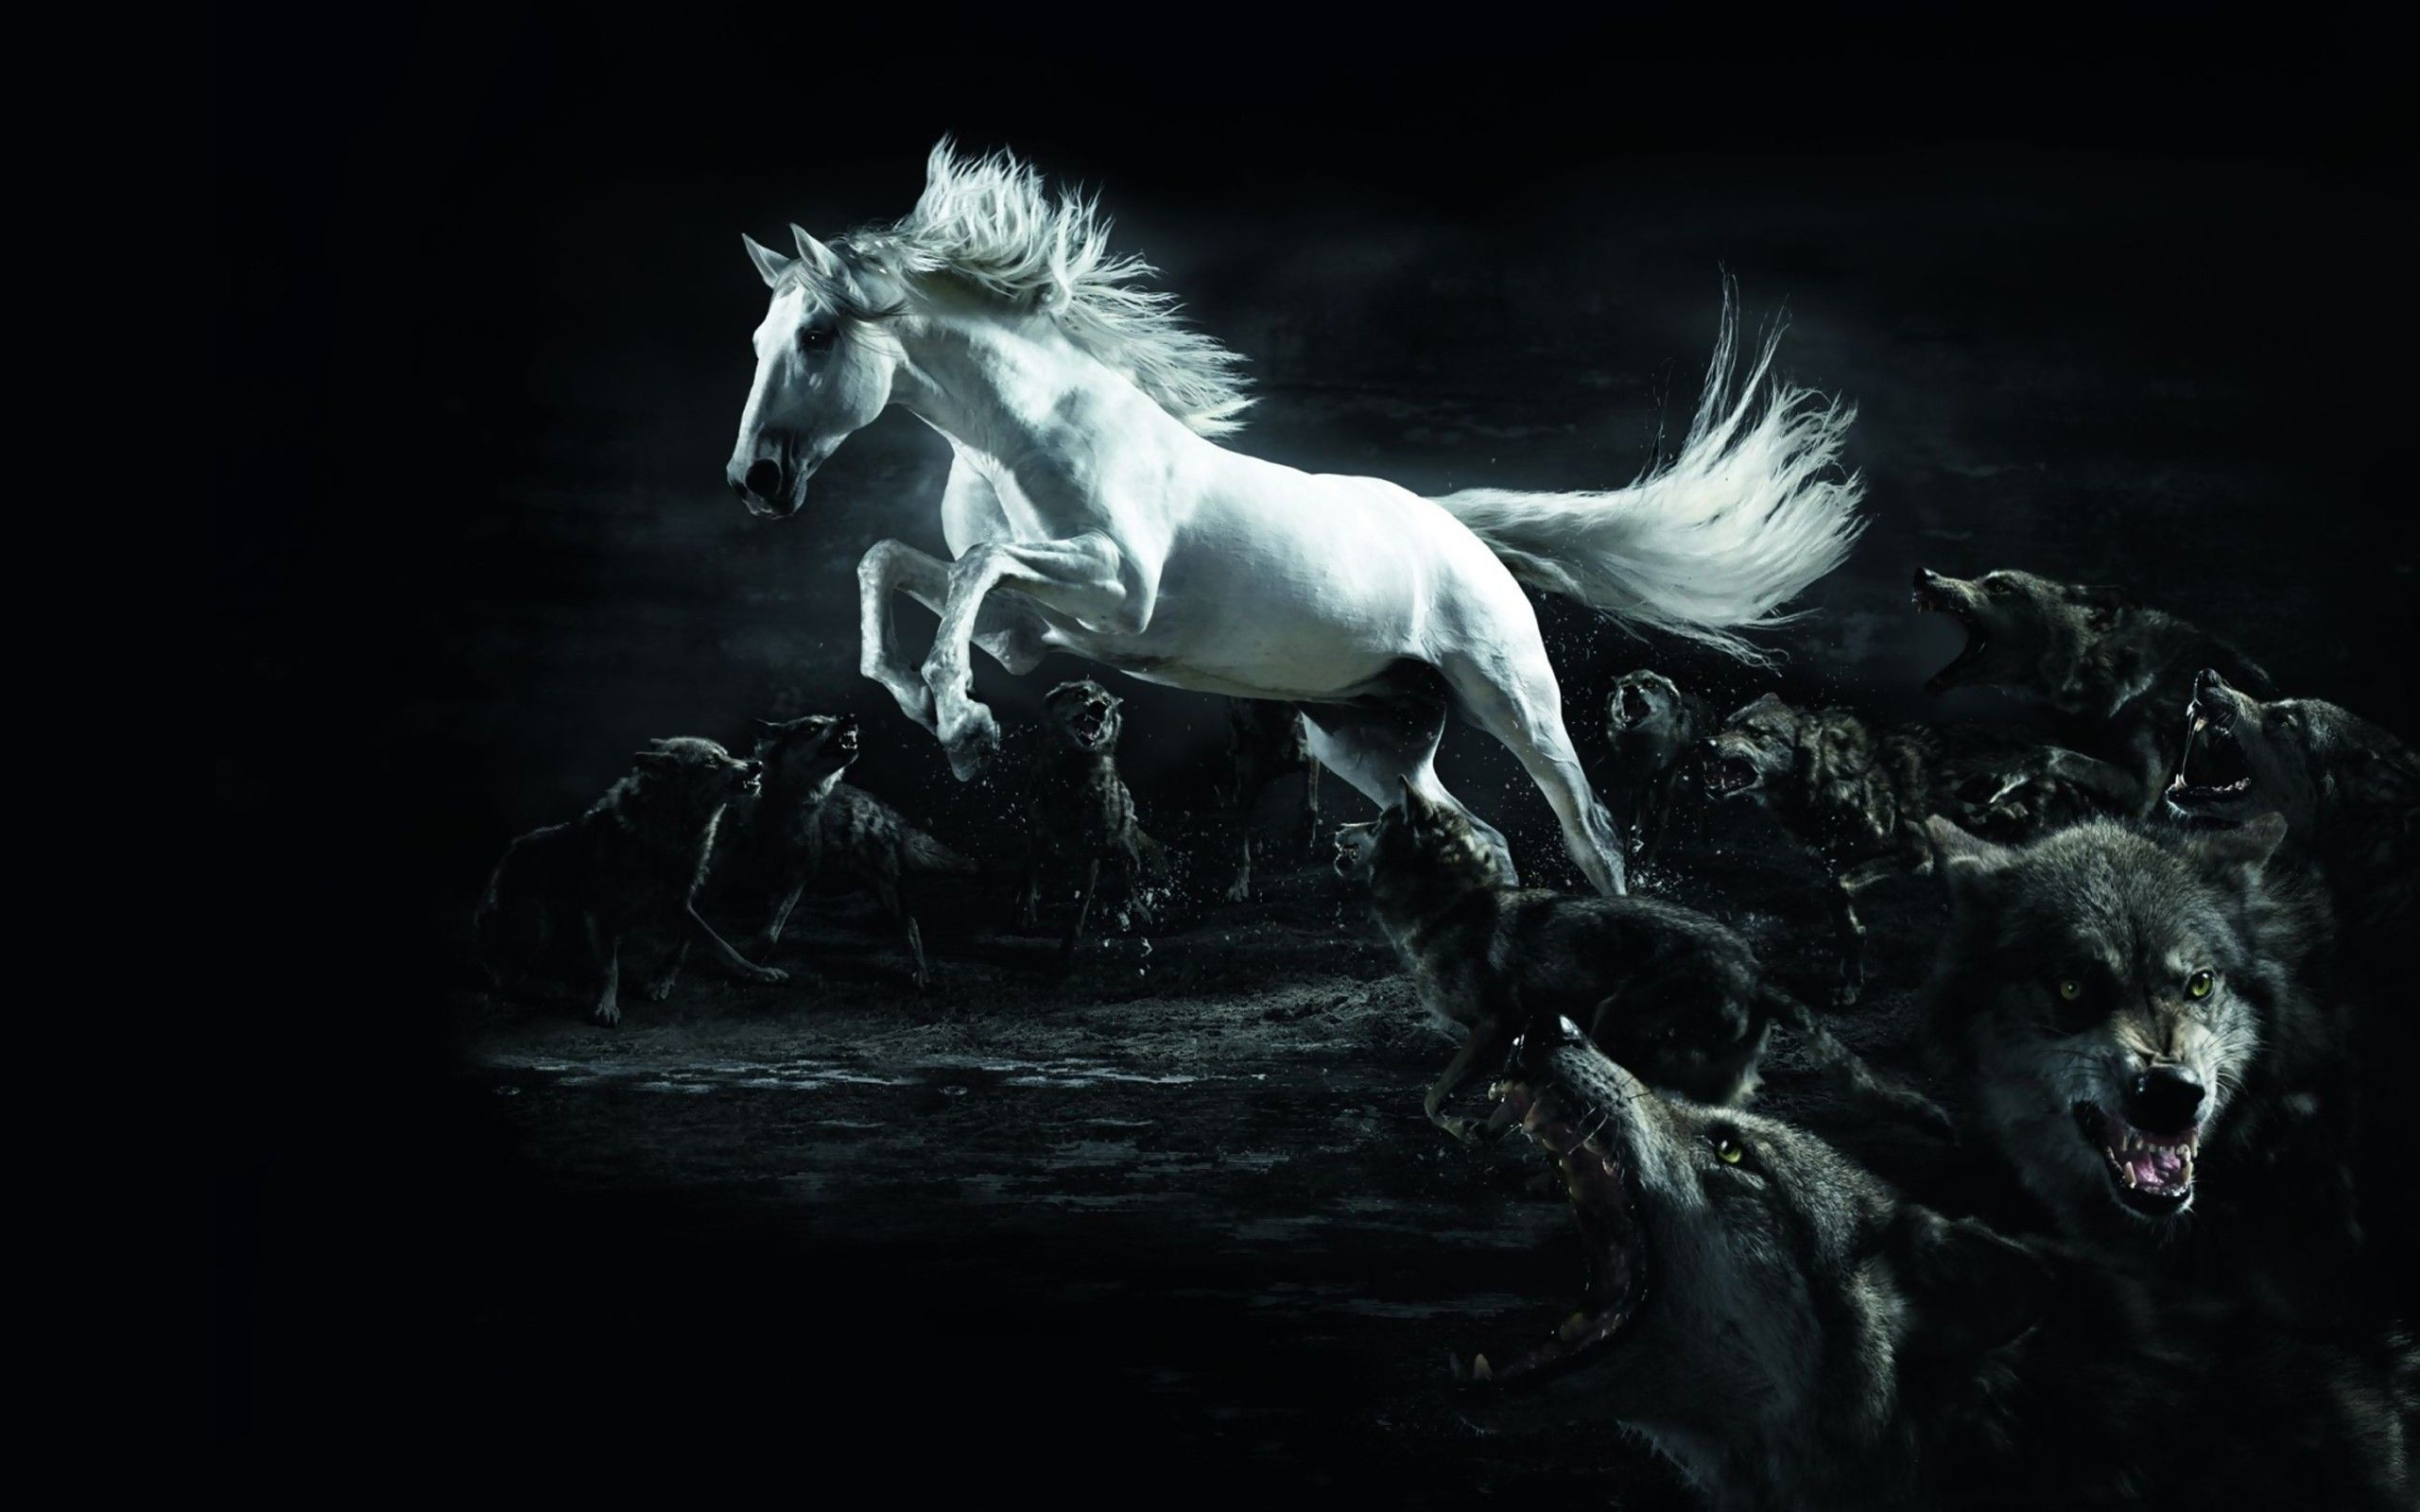 Fantastic Wallpaper Horse Wolf - 0c880bfec541691cb3bf627cd76a70c4  Snapshot_7862100.jpg